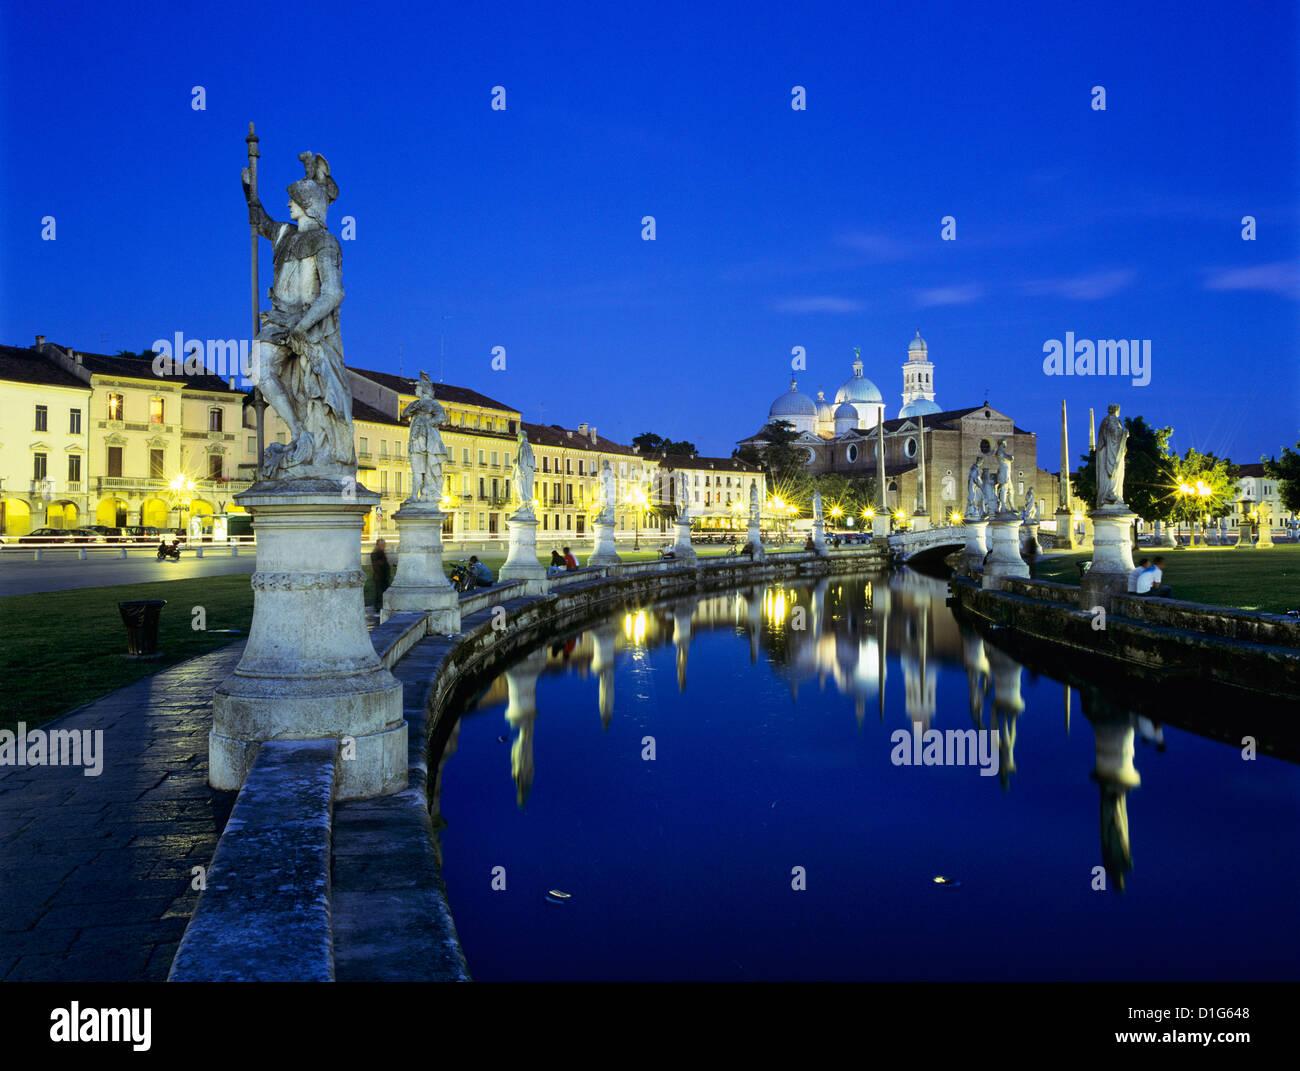 Prato della Valle and Santa Giustina at night, Padua, Veneto, Italy, Europe - Stock Image